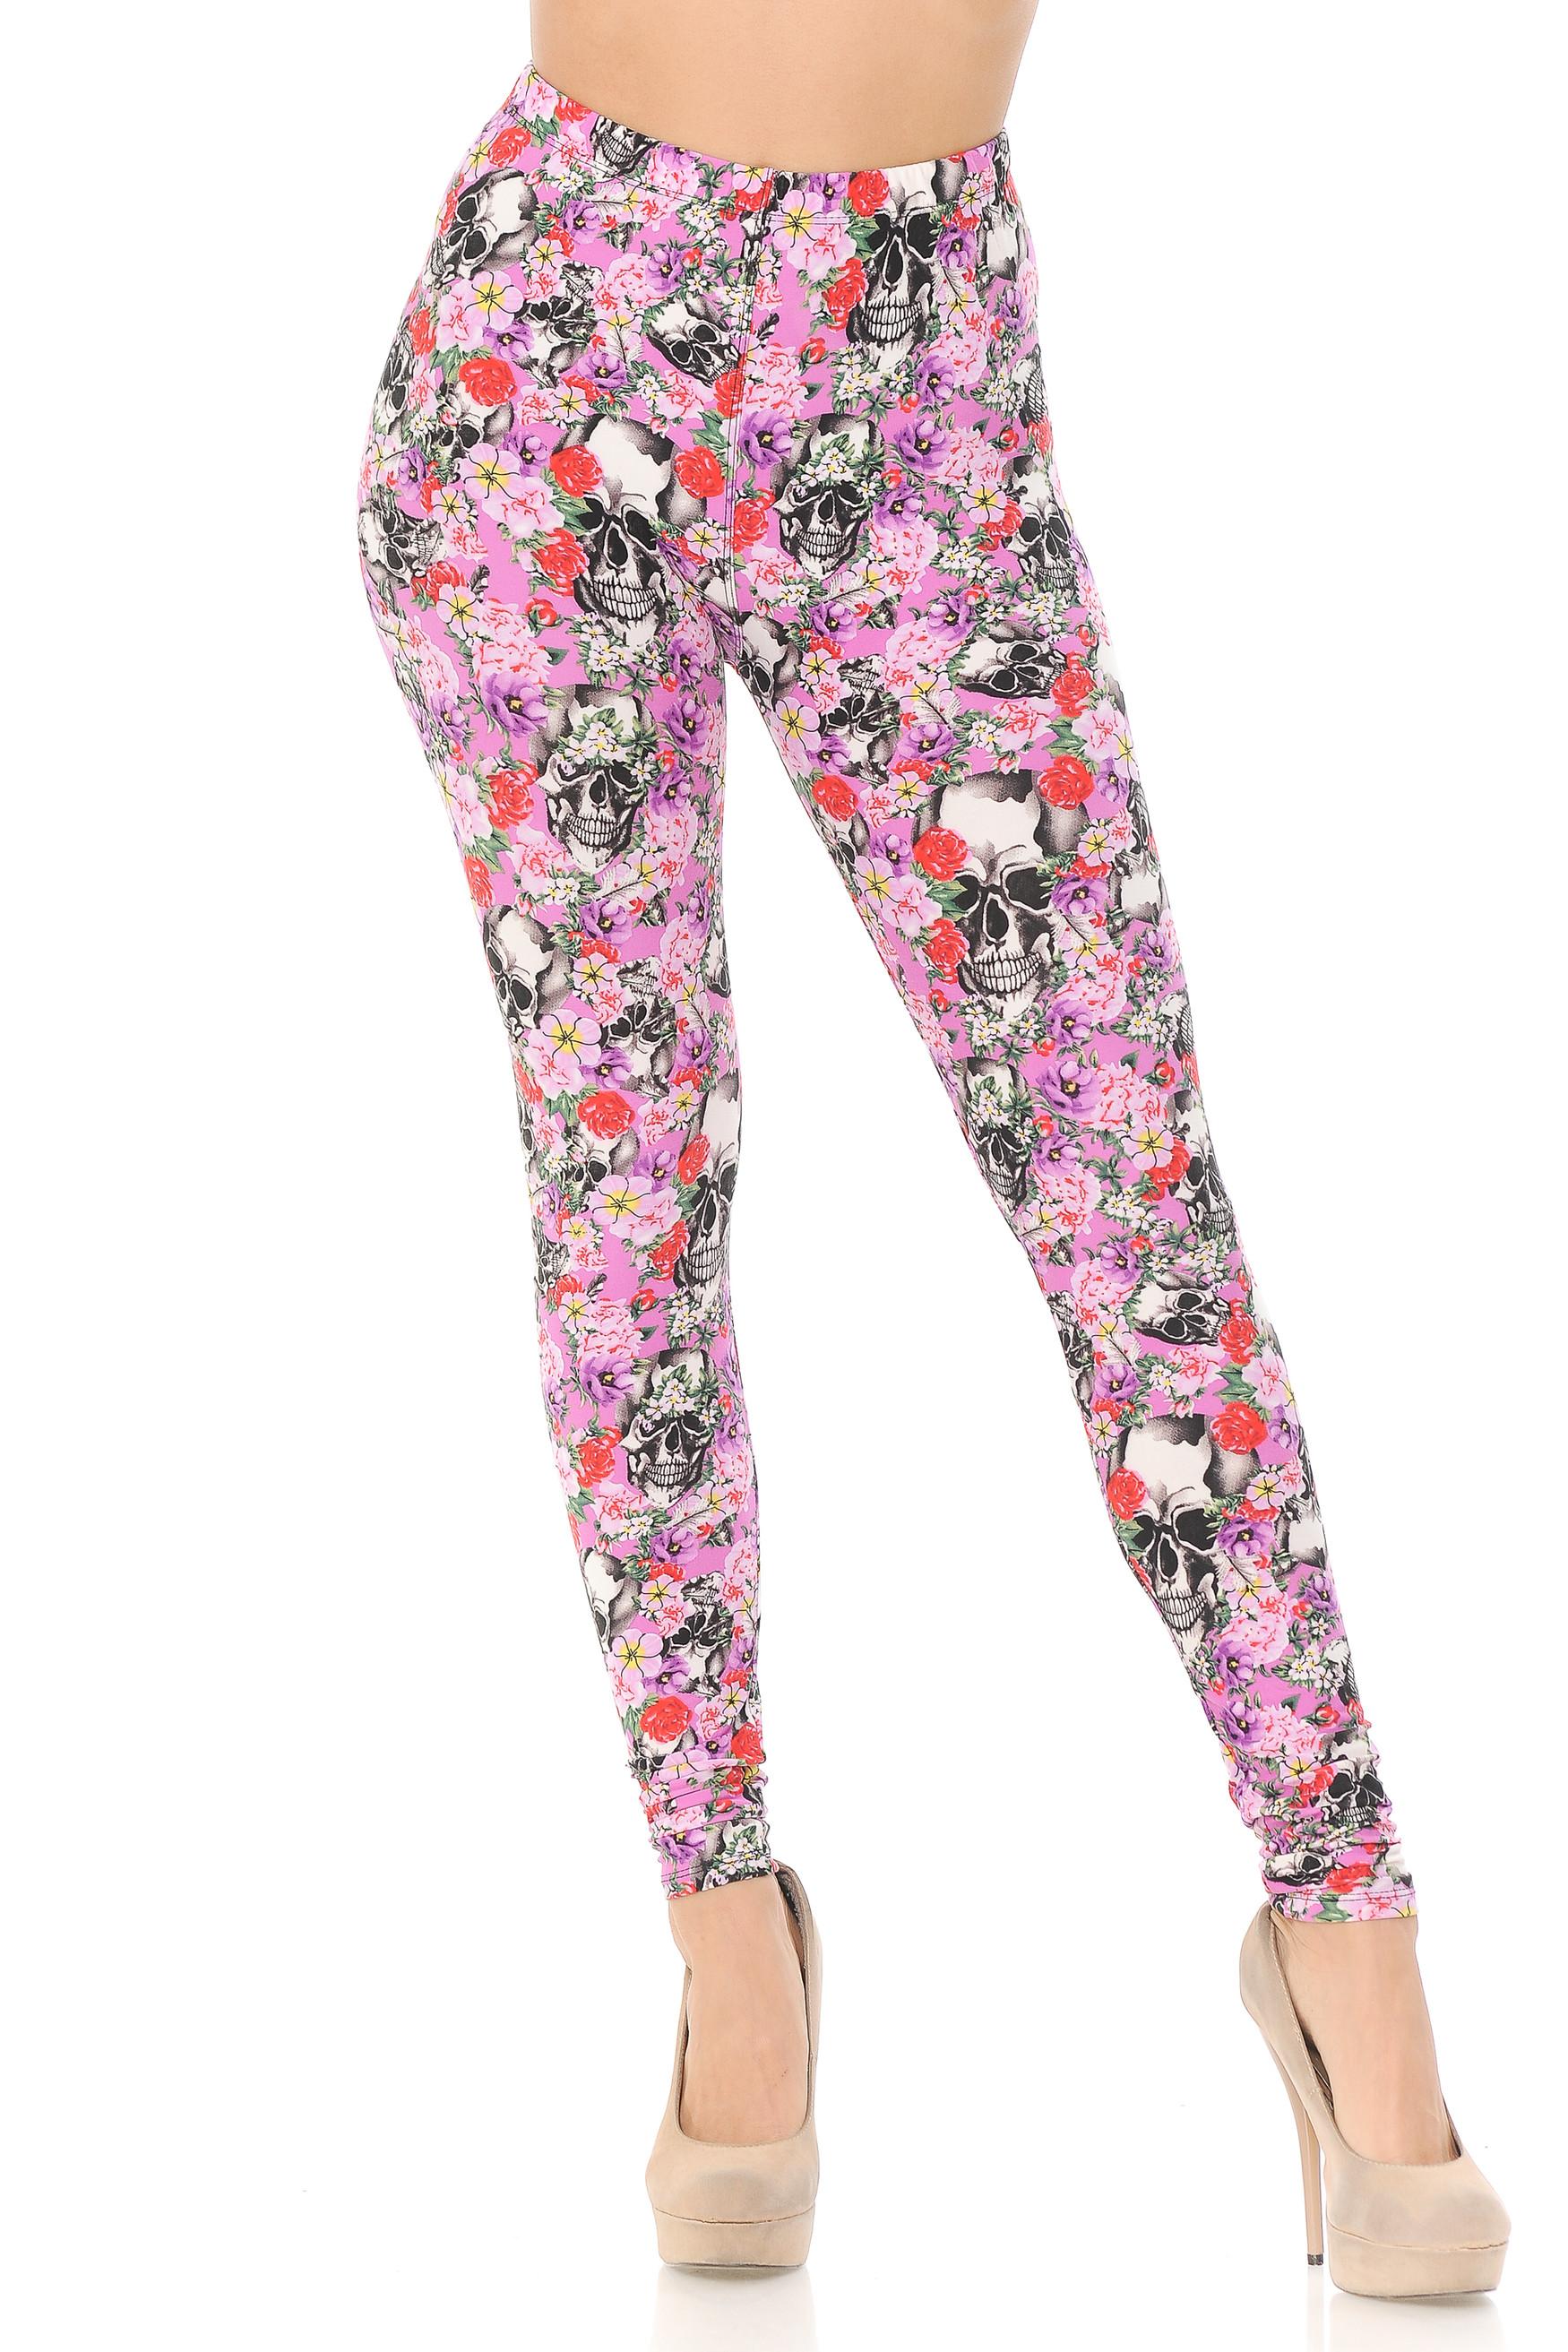 Brushed  Pink Blossom Skulls Extra Plus Size Leggings - 3X-5X